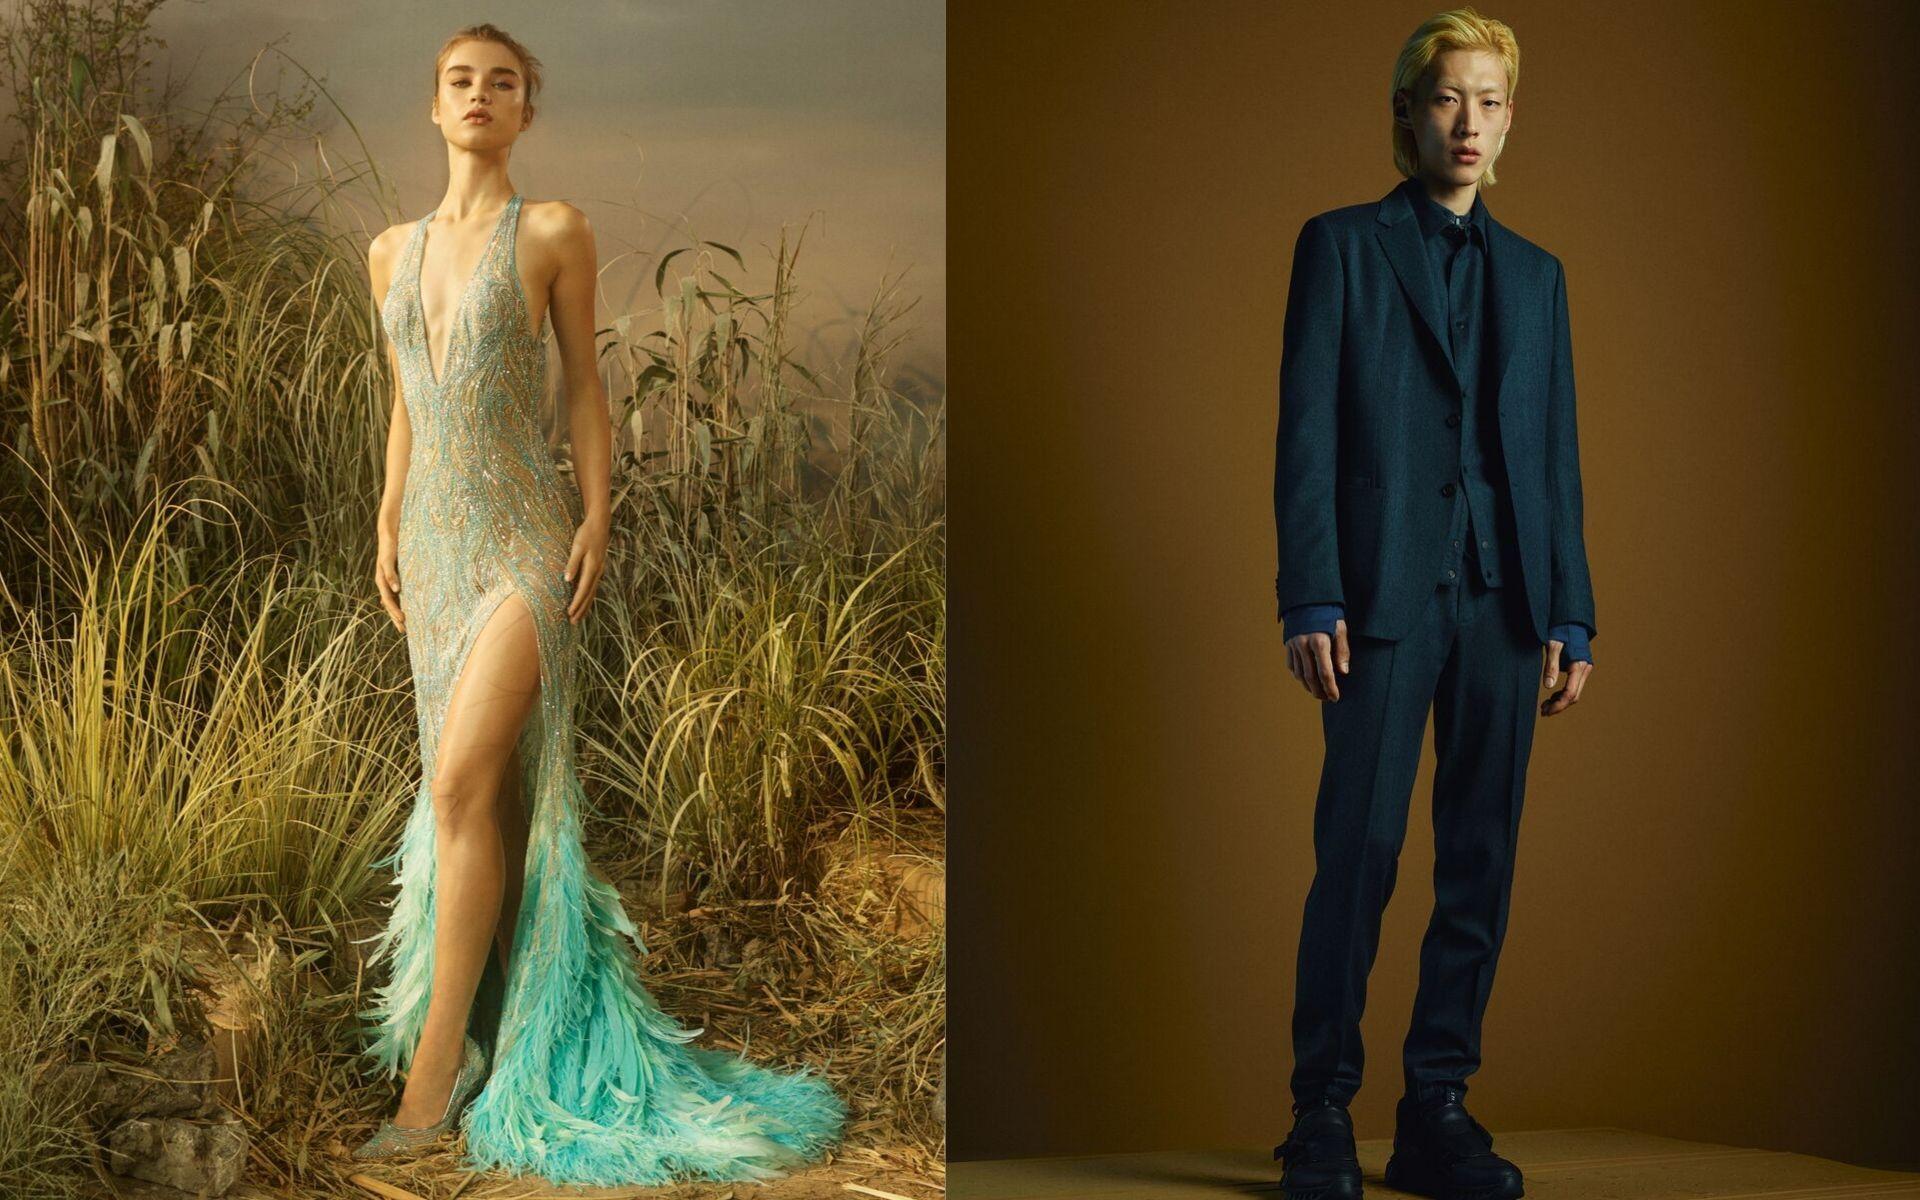 Photo: Courtesy of Versace & Ermenegildo Zegna